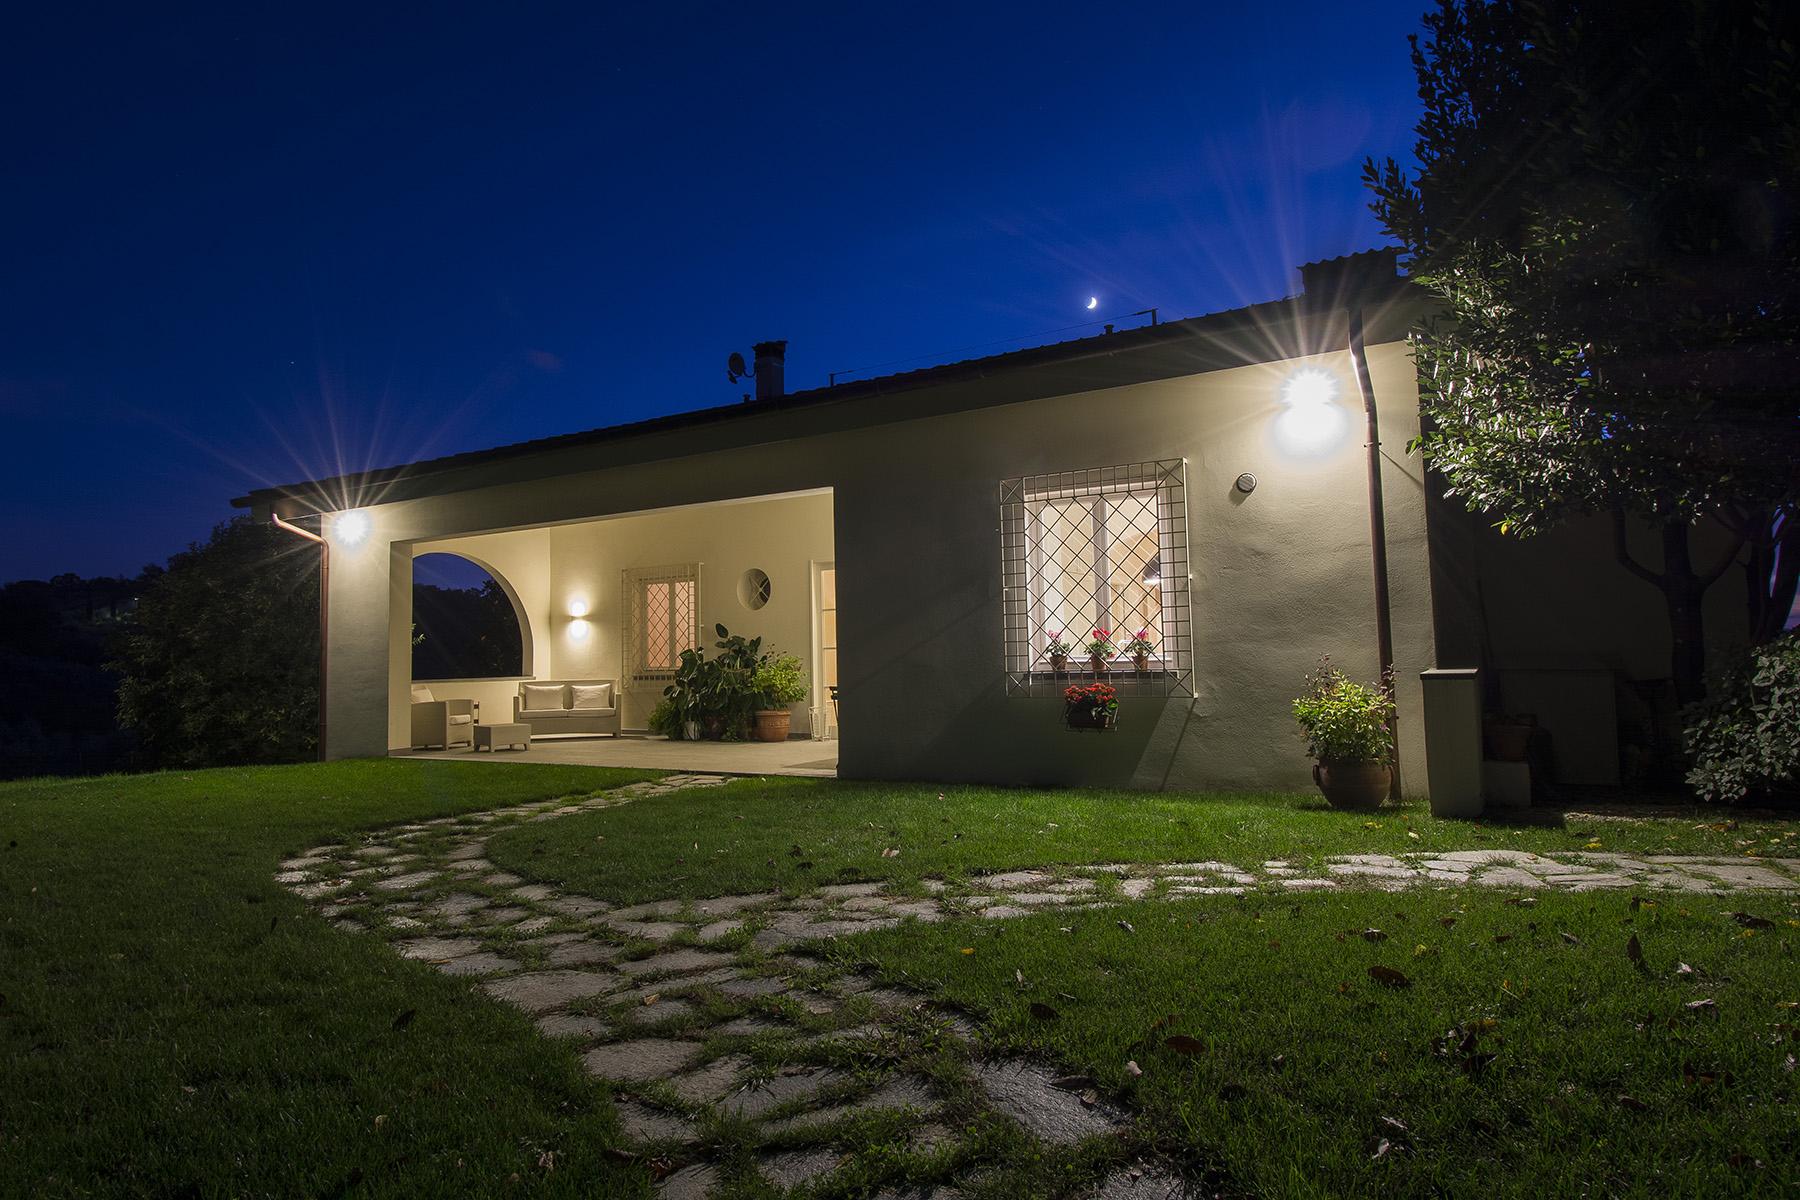 Villa in Vendita a Lucca: 5 locali, 470 mq - Foto 7